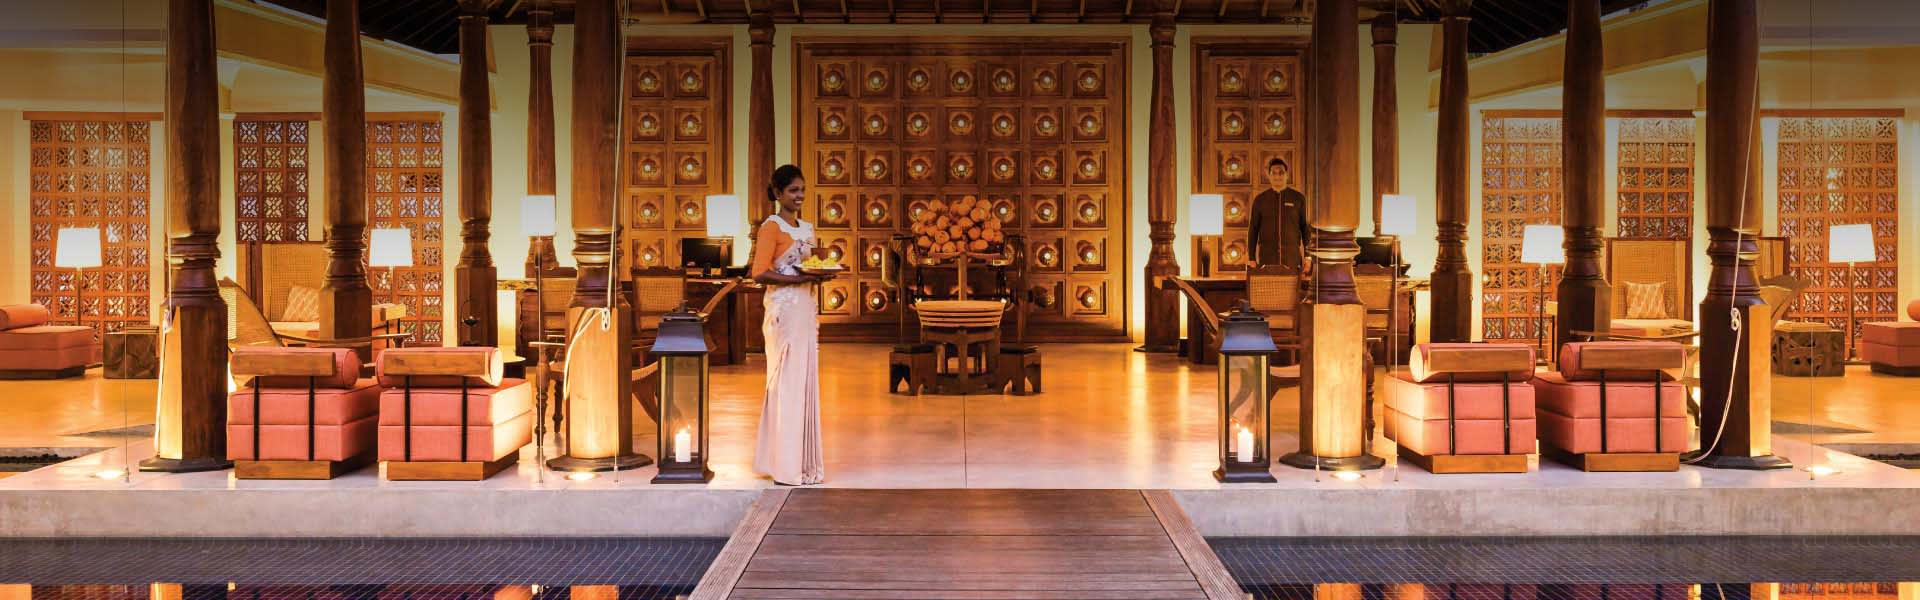 Luxury Hotel Jobs at Anantara | Careers | Anantara Hotels & Resorts